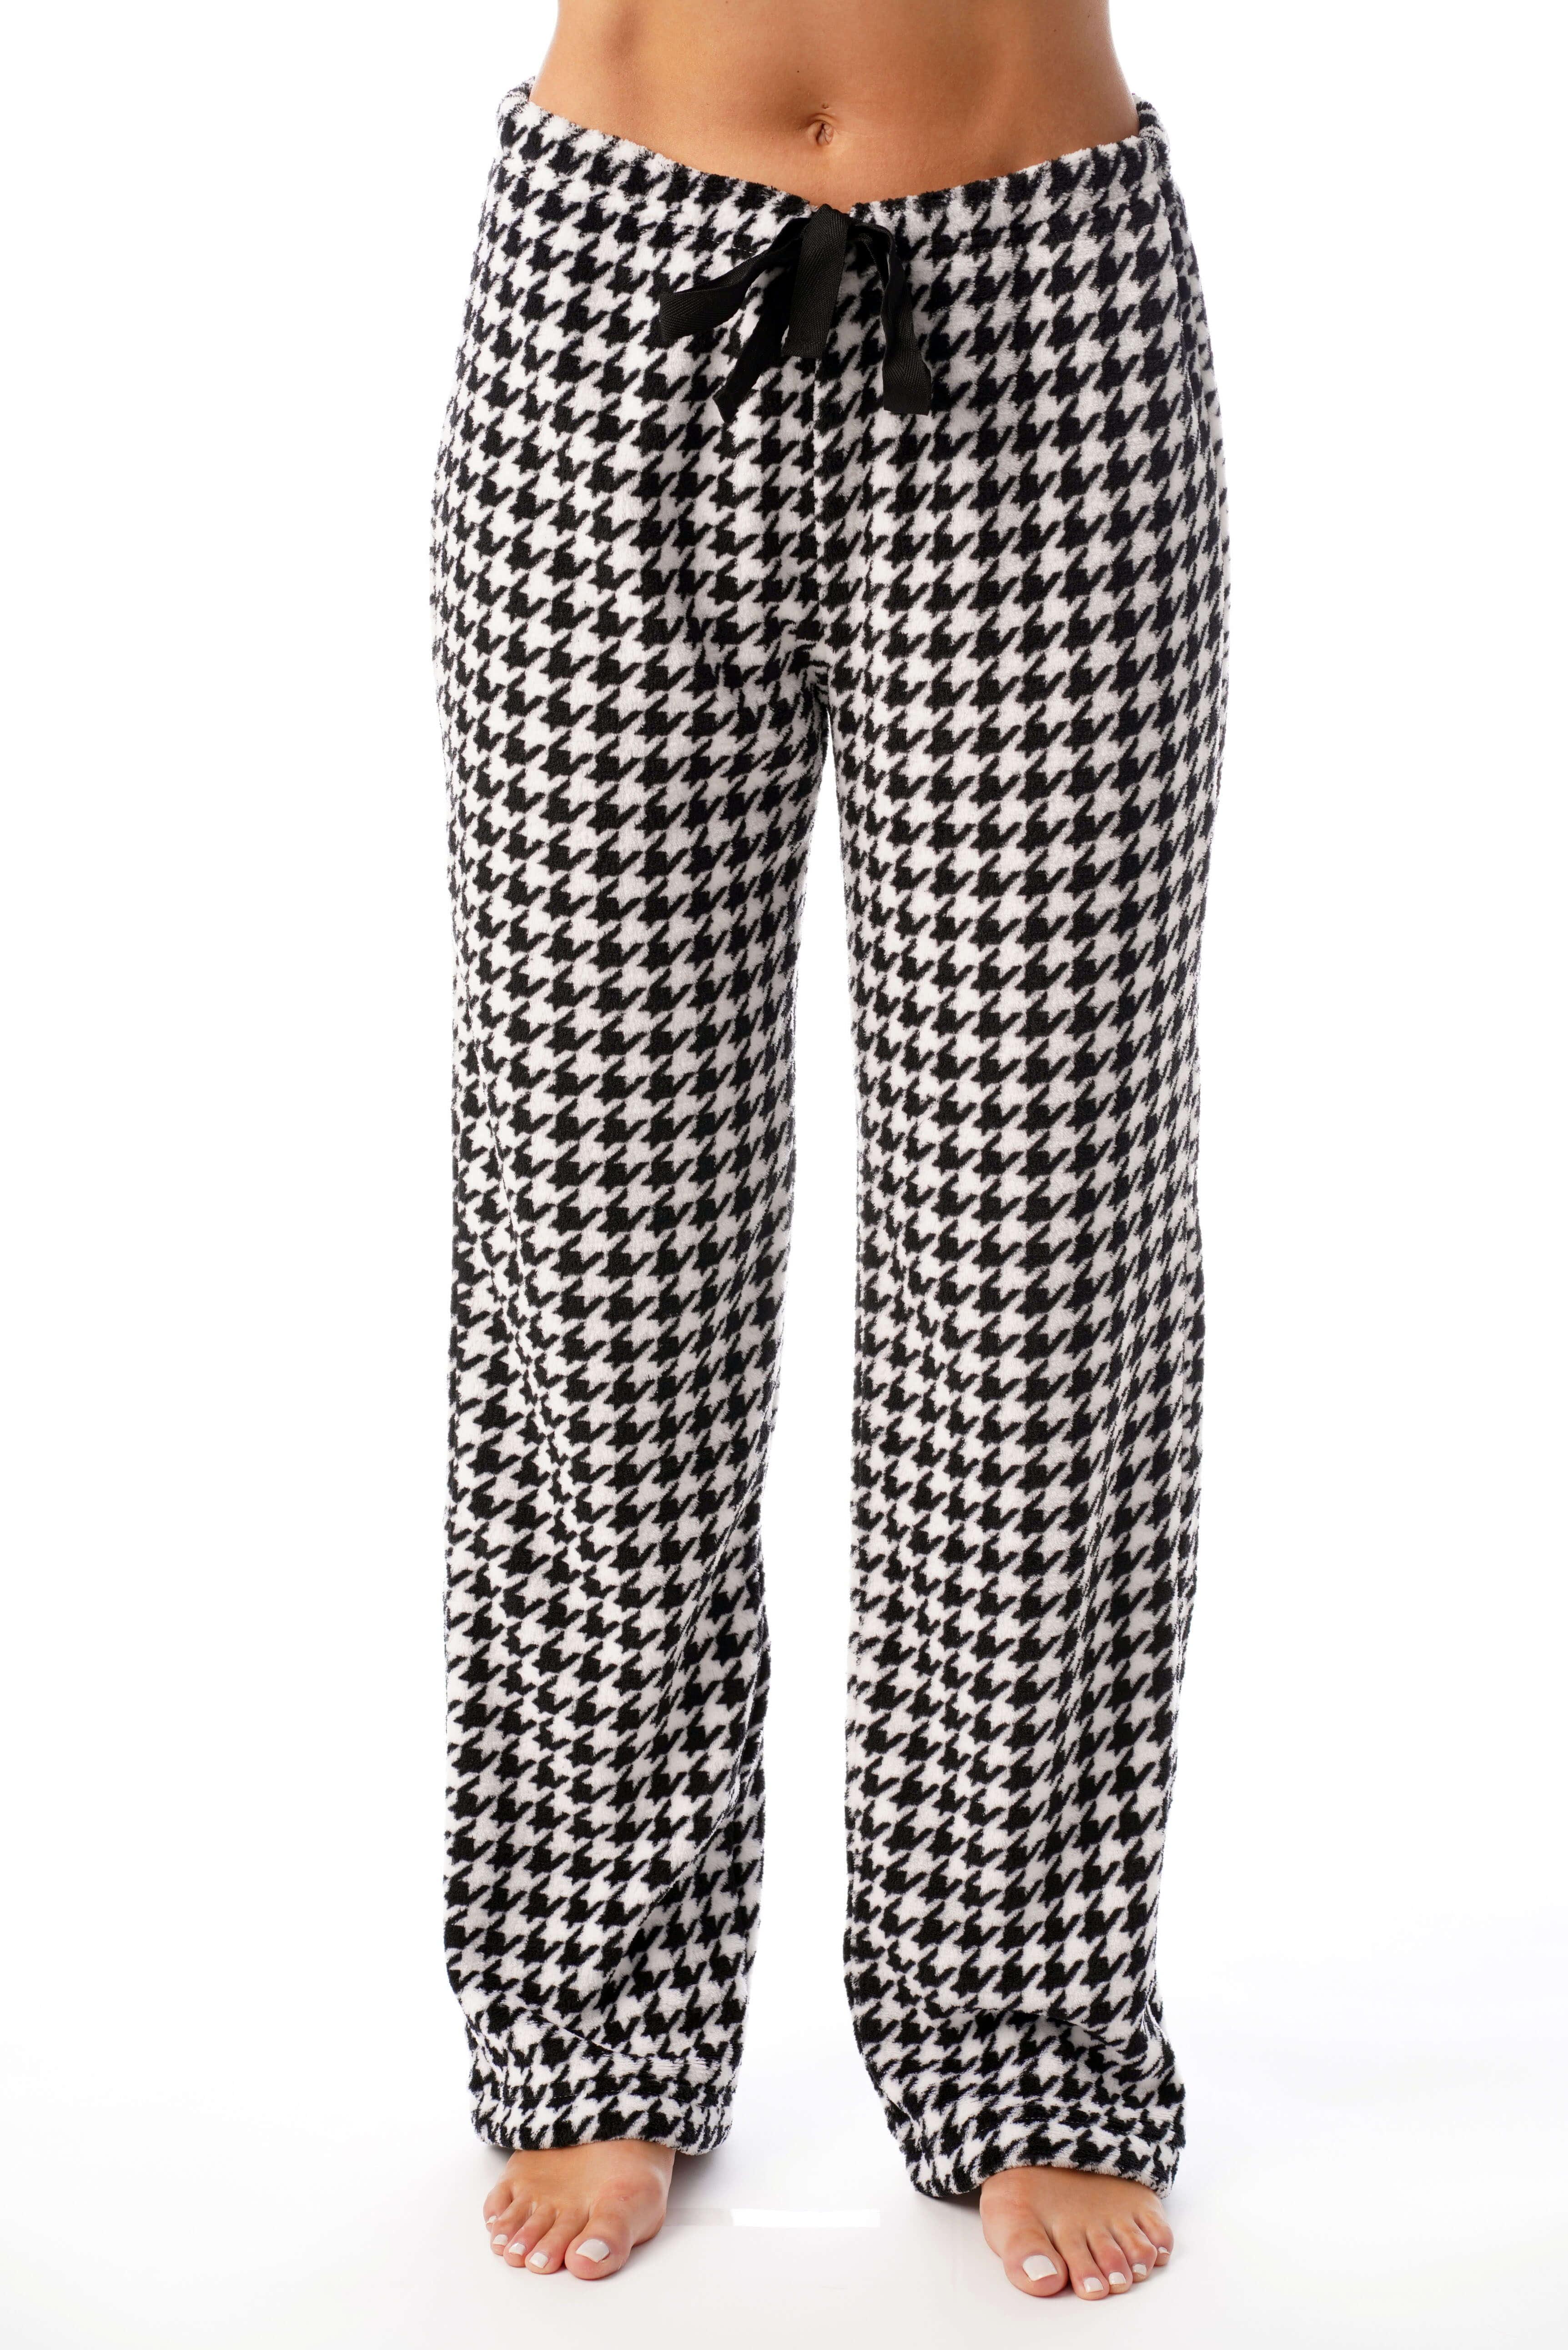 Sayhi Girls Jean Denim Loose Polka Dots Drawstring Shorts